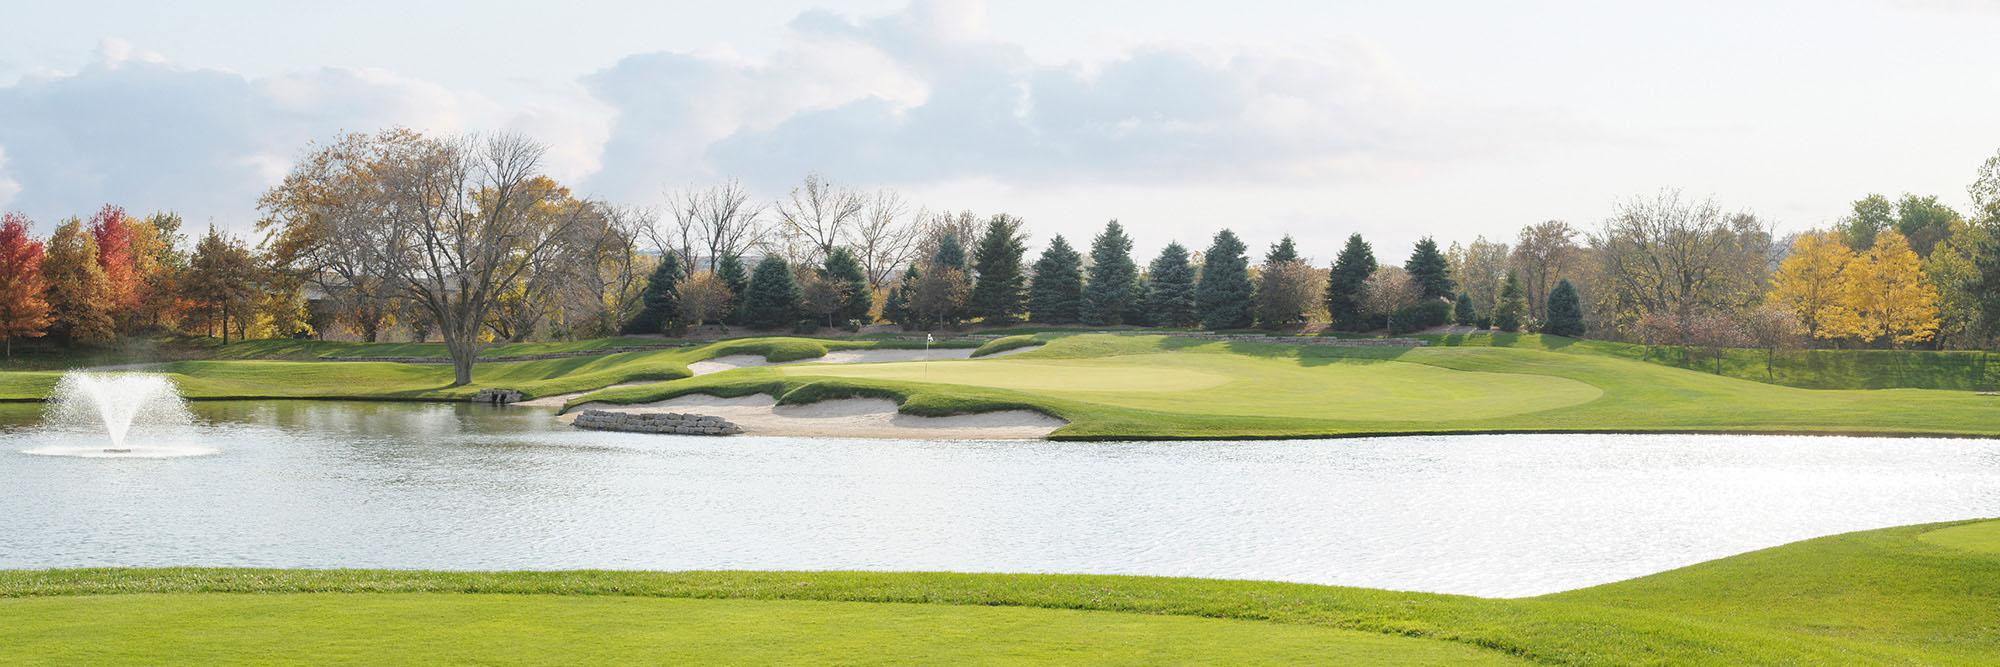 Golf Course Image - Oak Hill No. 2